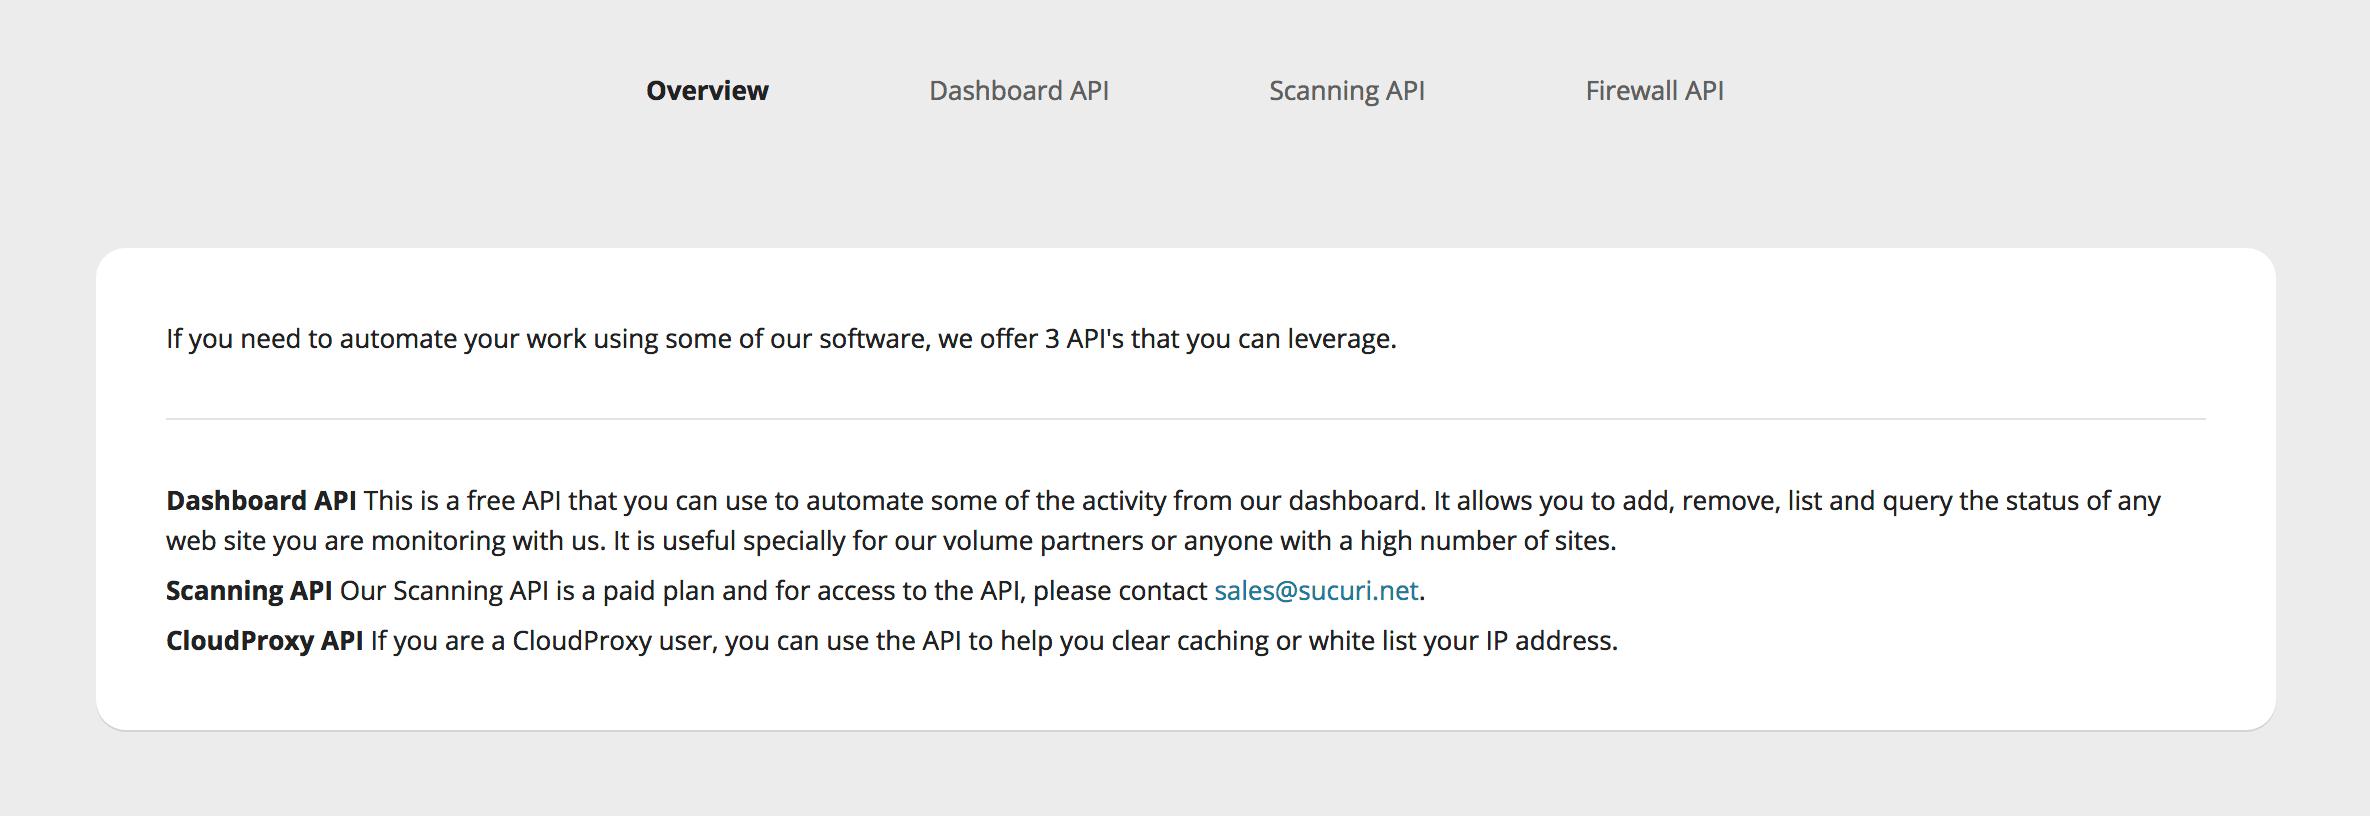 Overview API